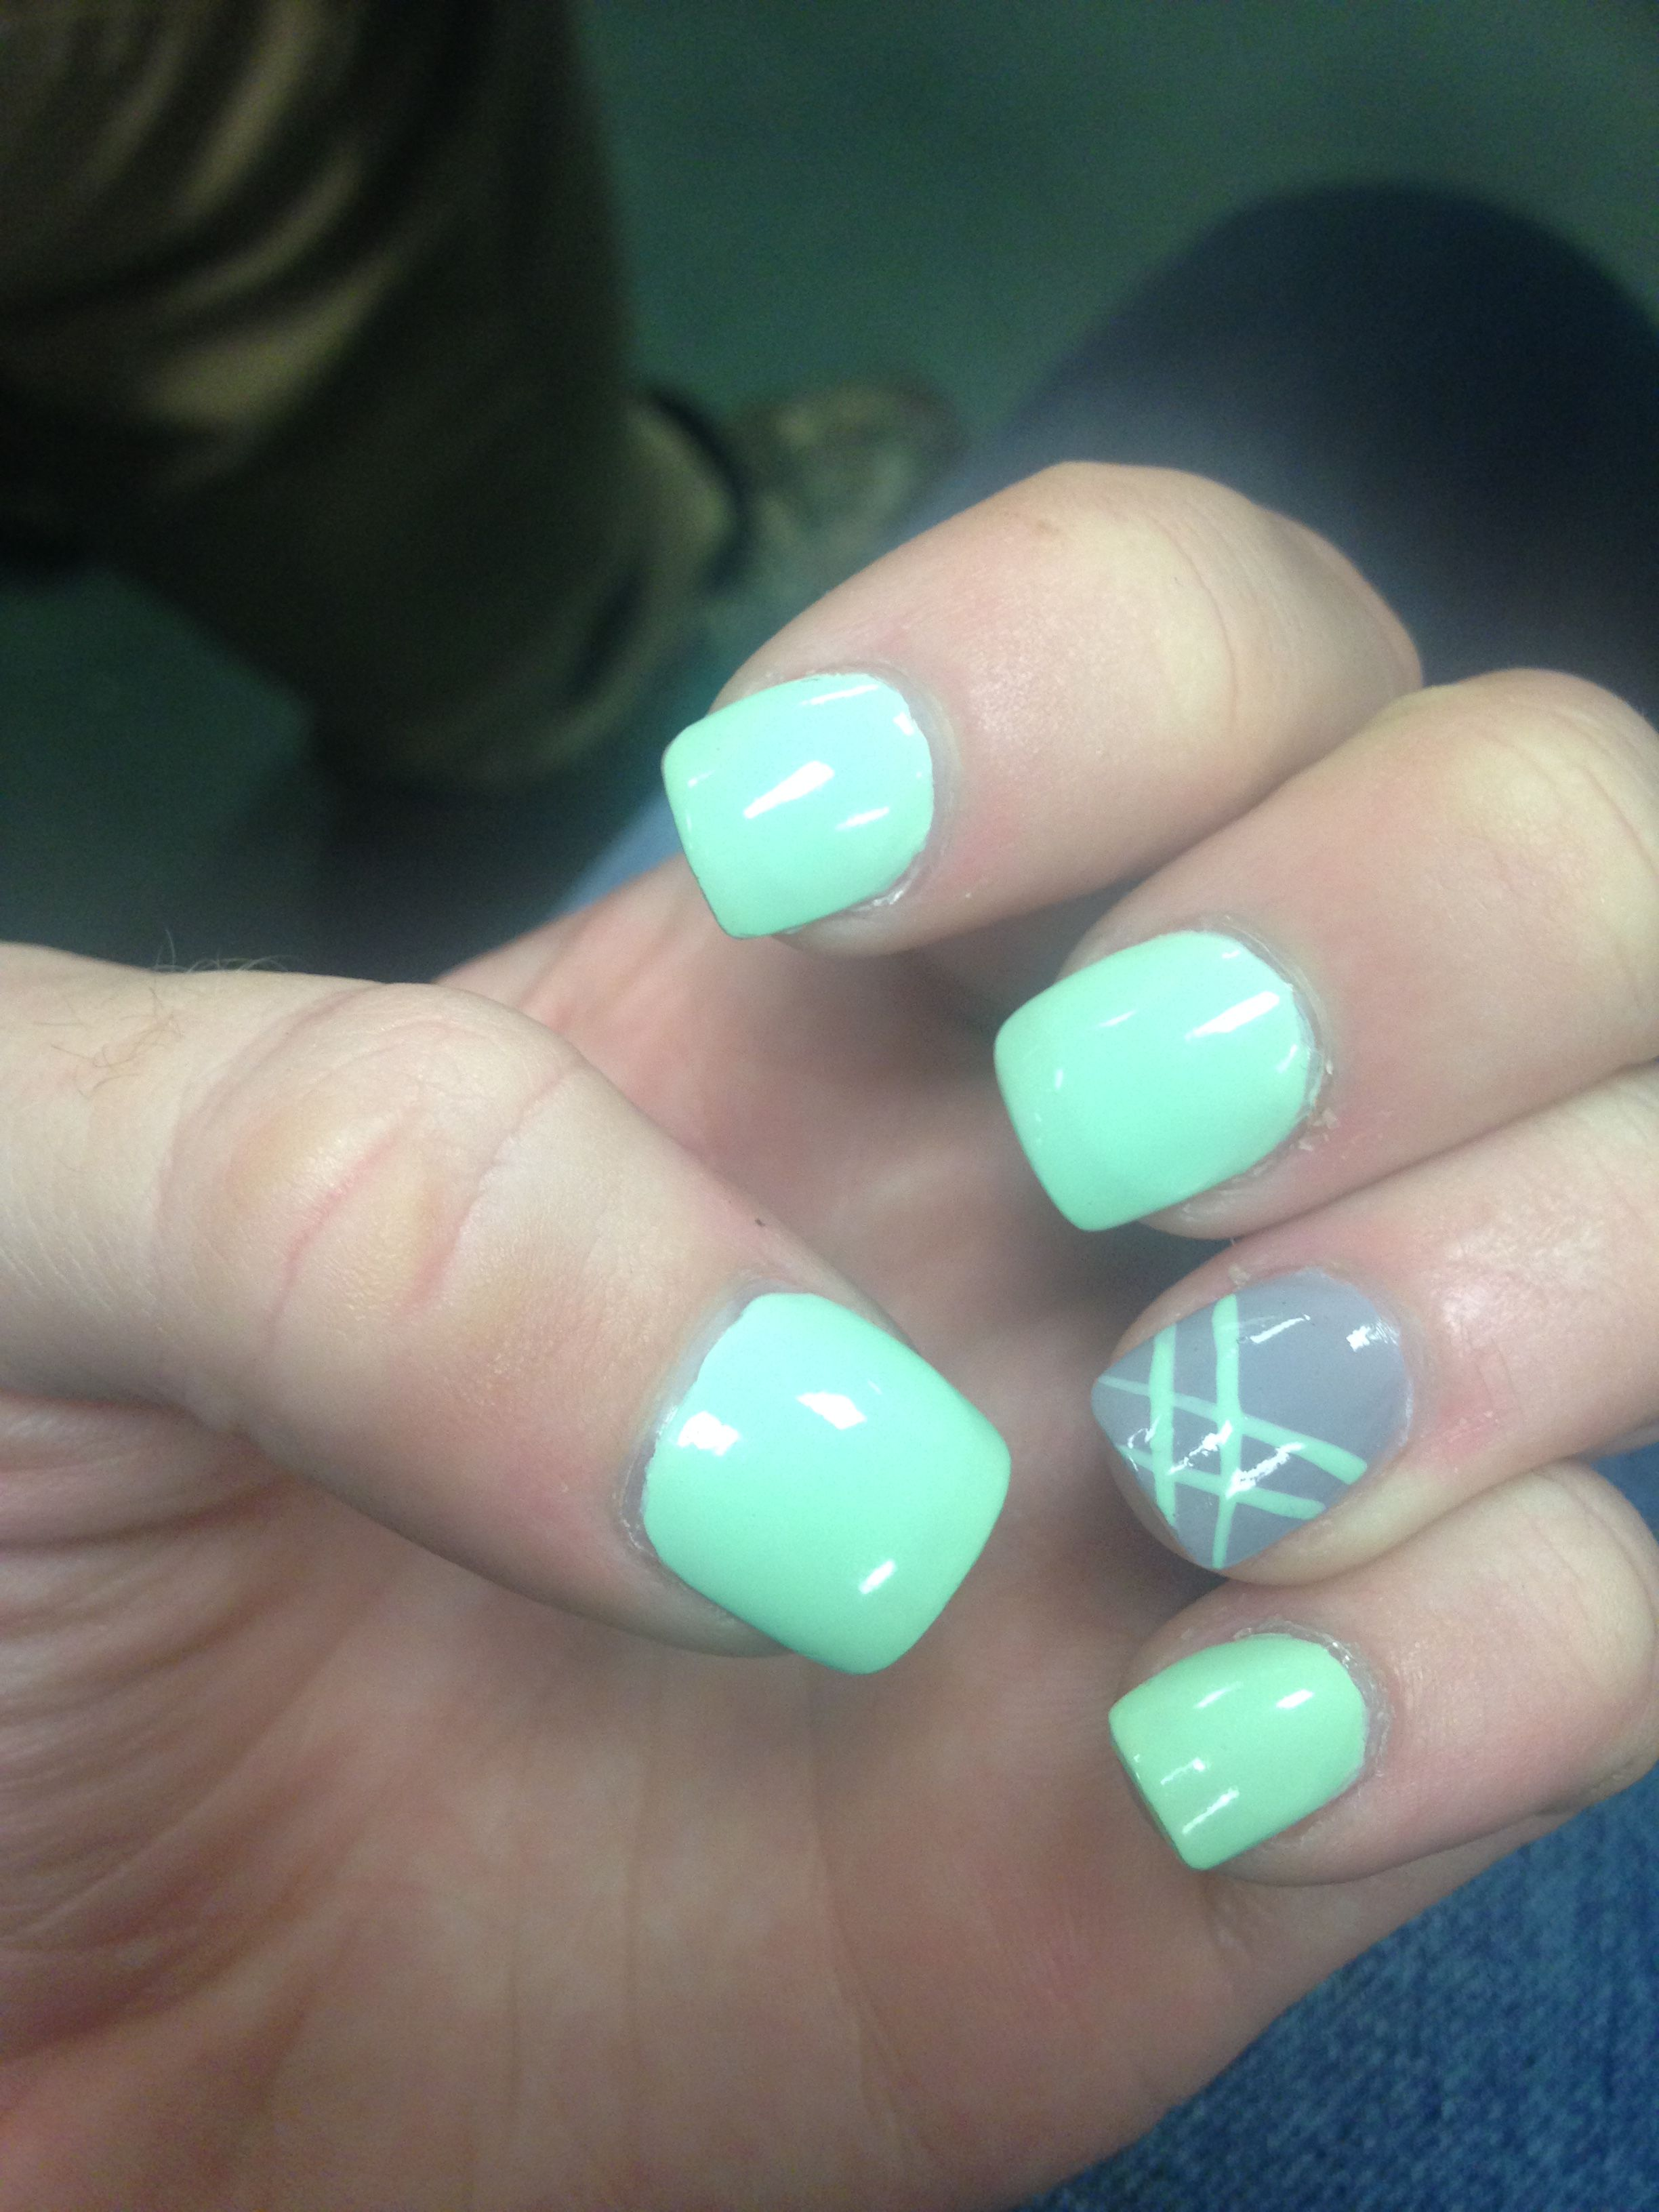 My Nails Mint Green And Grey Mint Green Nails Green Nails Mint Nails